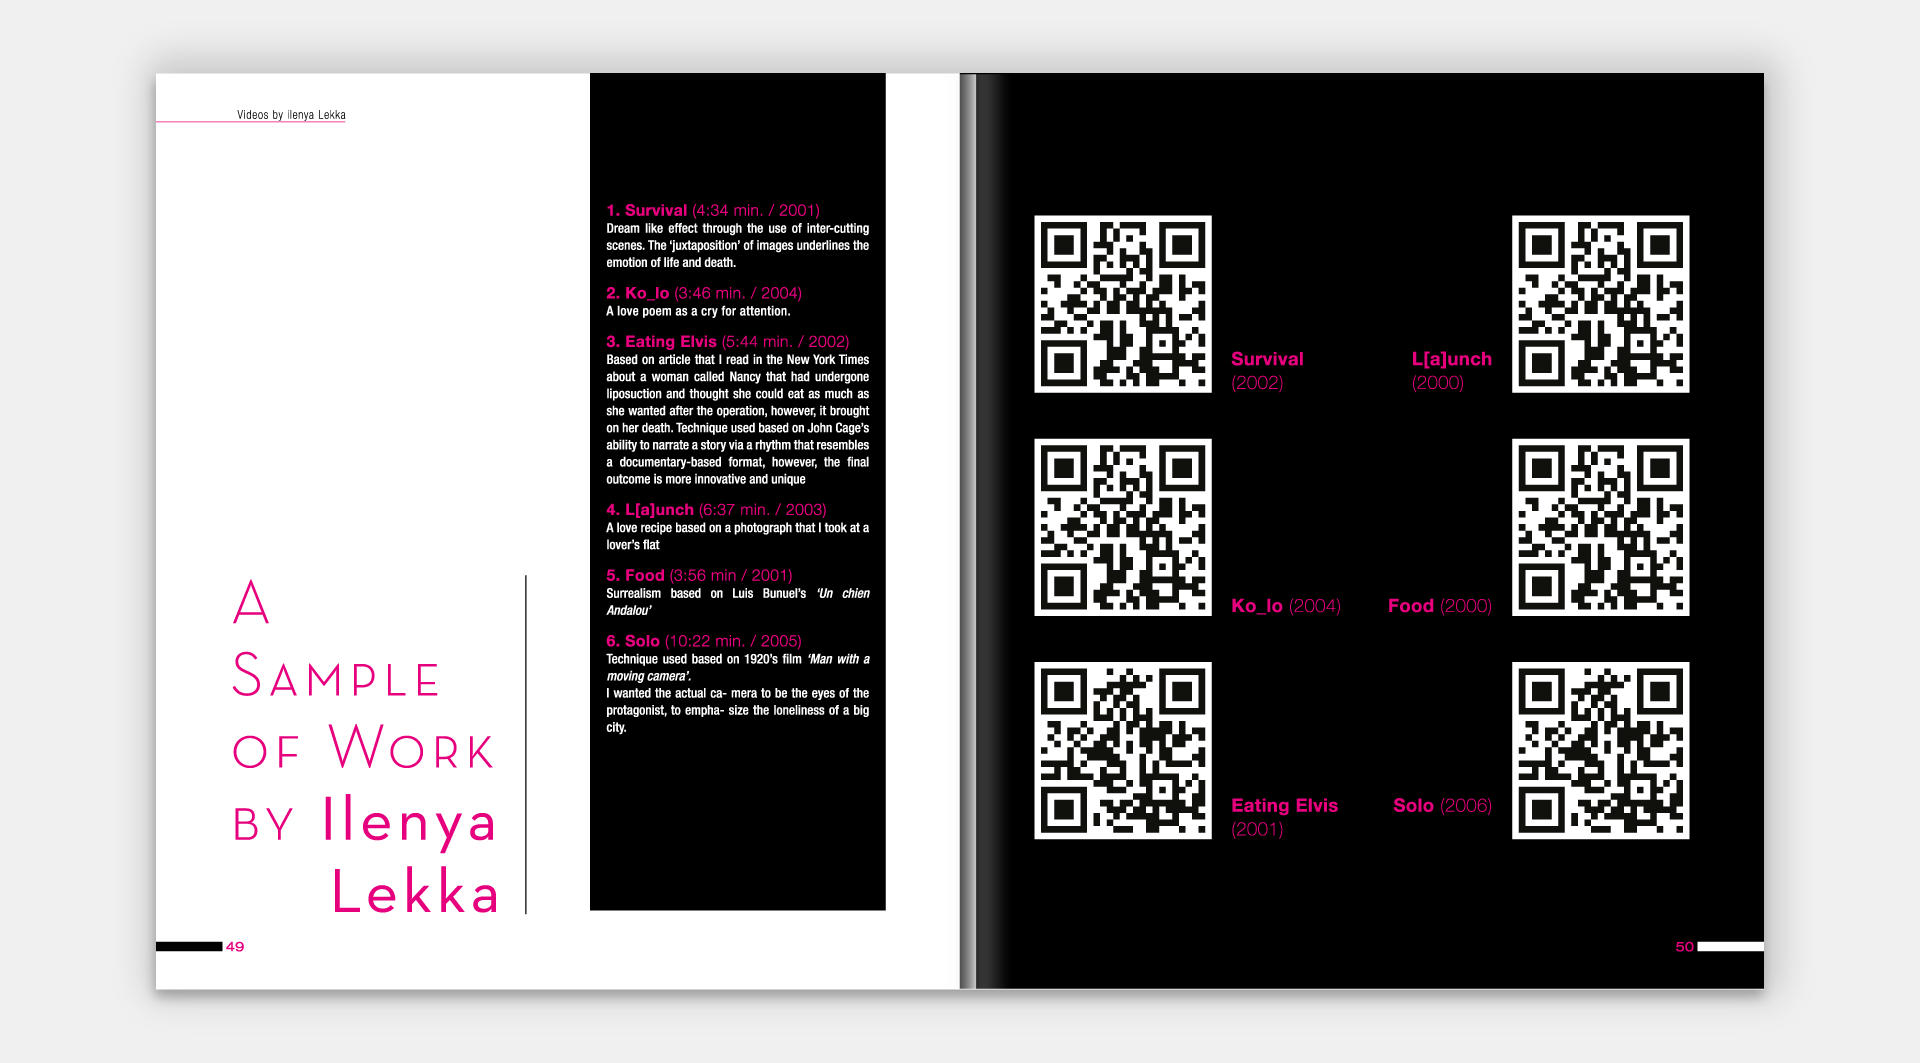 Seite 47-48